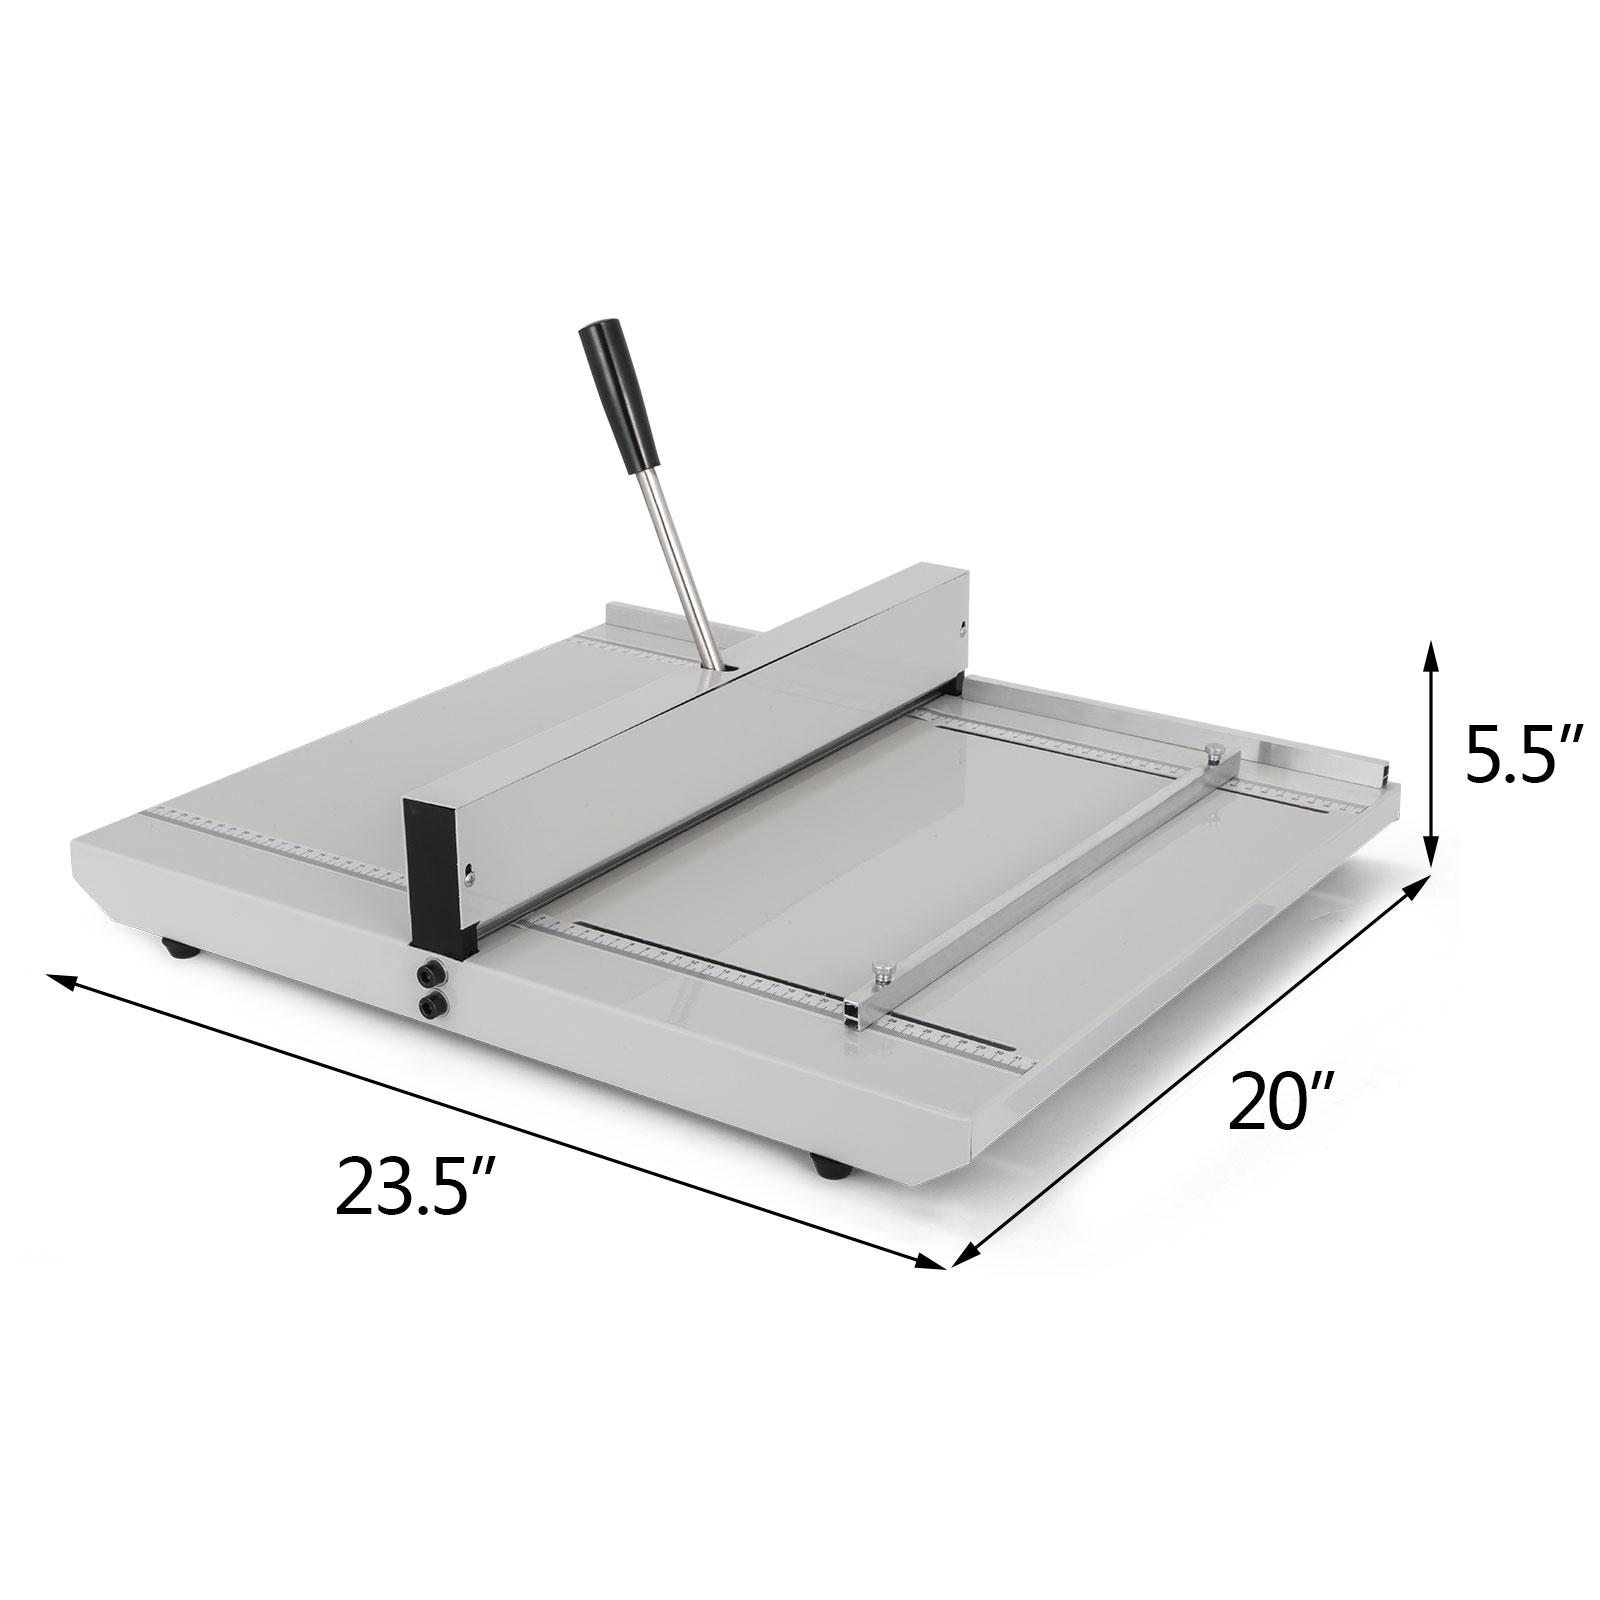 Cordonatrice-Perforatrice-Max-350-520mm-Profondita-Regolabile-Elettrica-Manuale miniatura 49